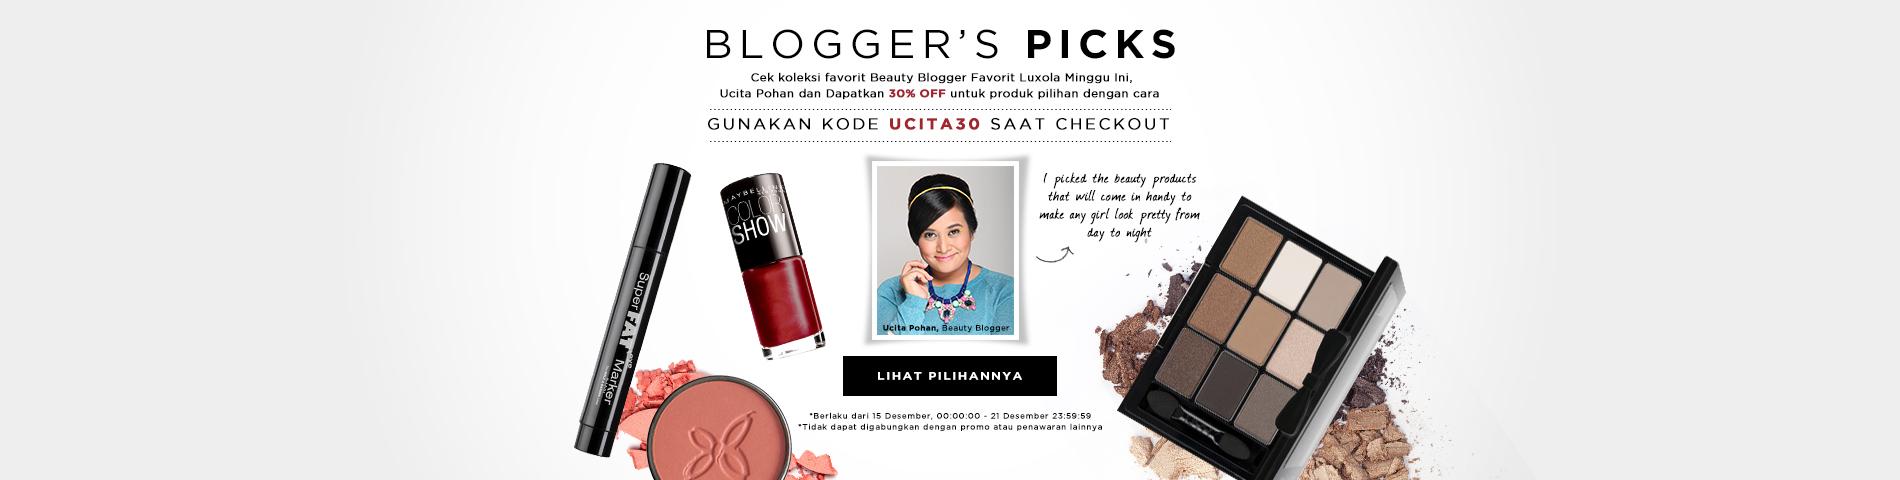 Wk15 14 bloggerspick bb